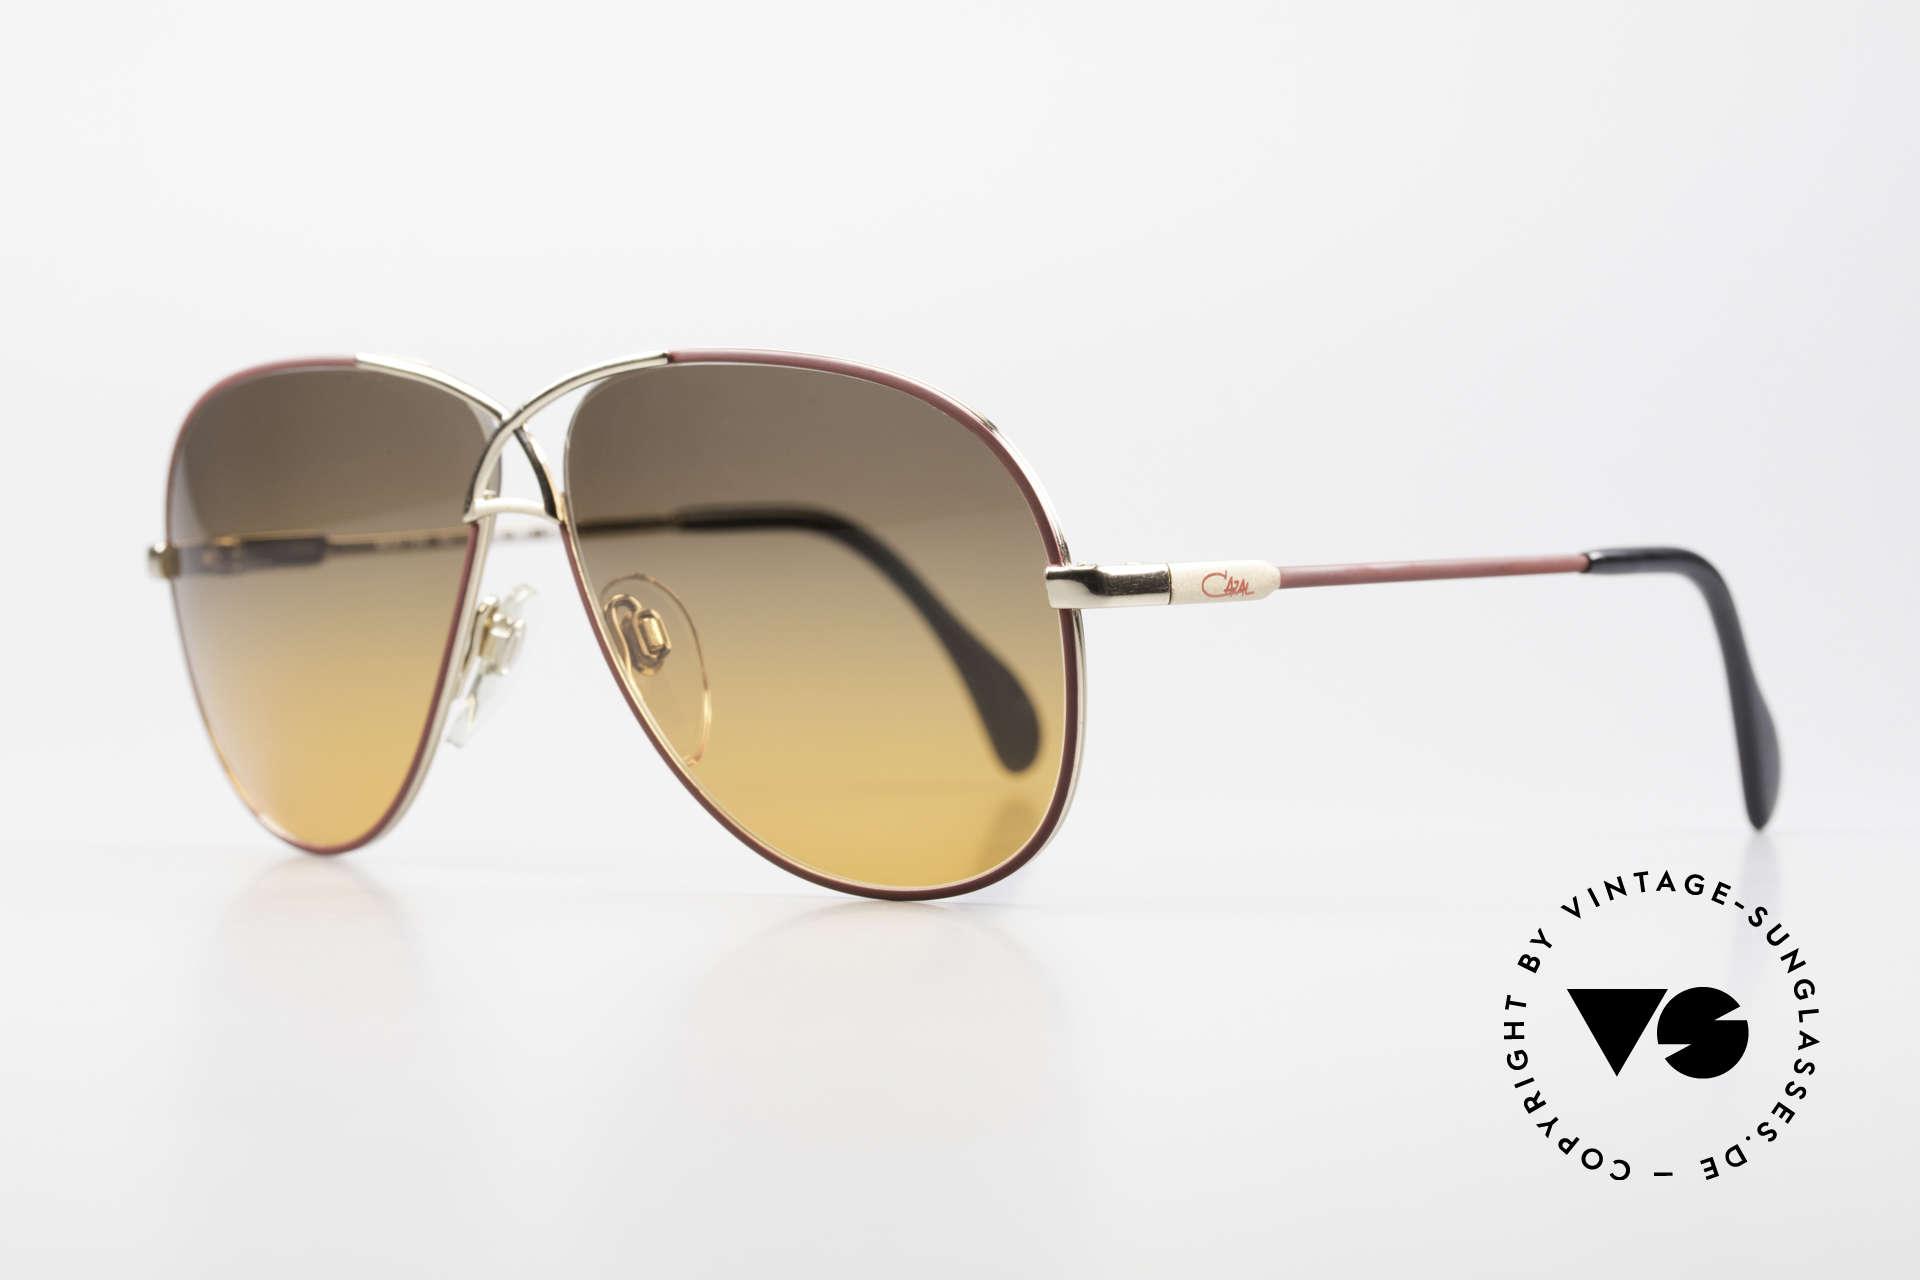 Cazal 728 80's Designer Aviator Shades, lightweight curved frame; in medium size 59-11, Made for Men and Women